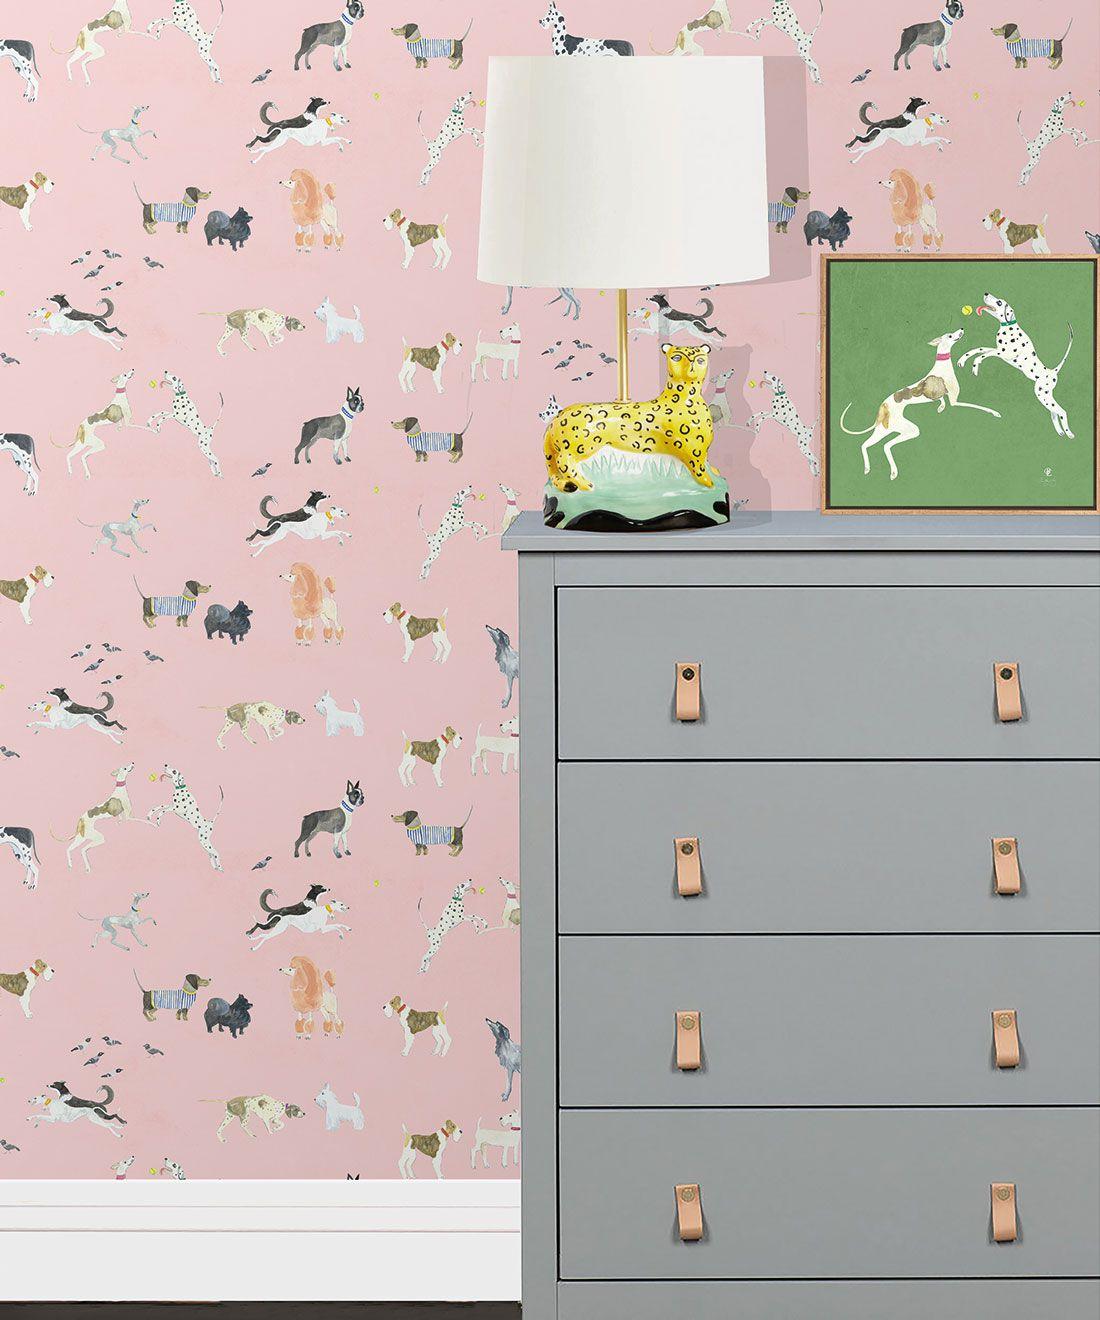 Doggies Wallpaper •Dog Wallpaper •Pink • Insitu with grey dresser